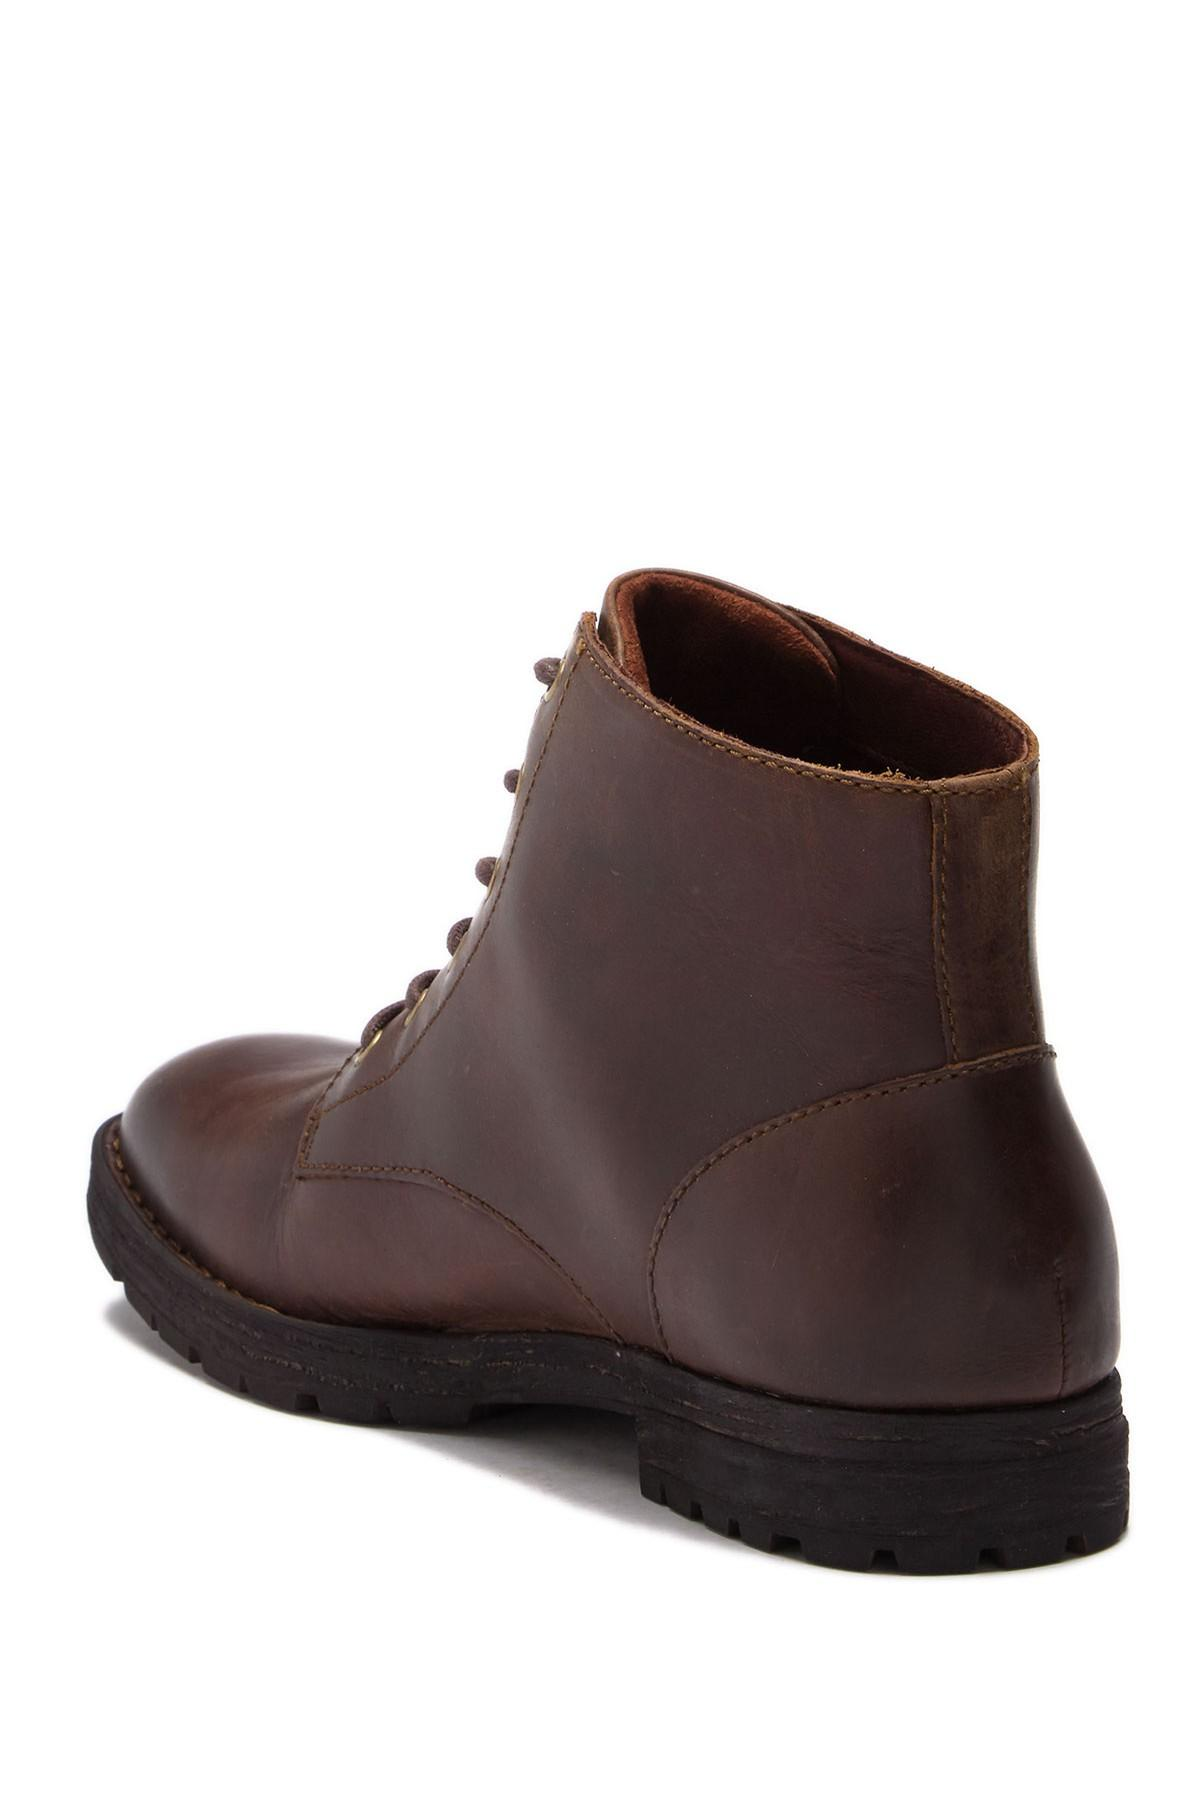 79247d138334 Born - Brown Hollis Plain Toe Leather Boot for Men - Lyst. View fullscreen